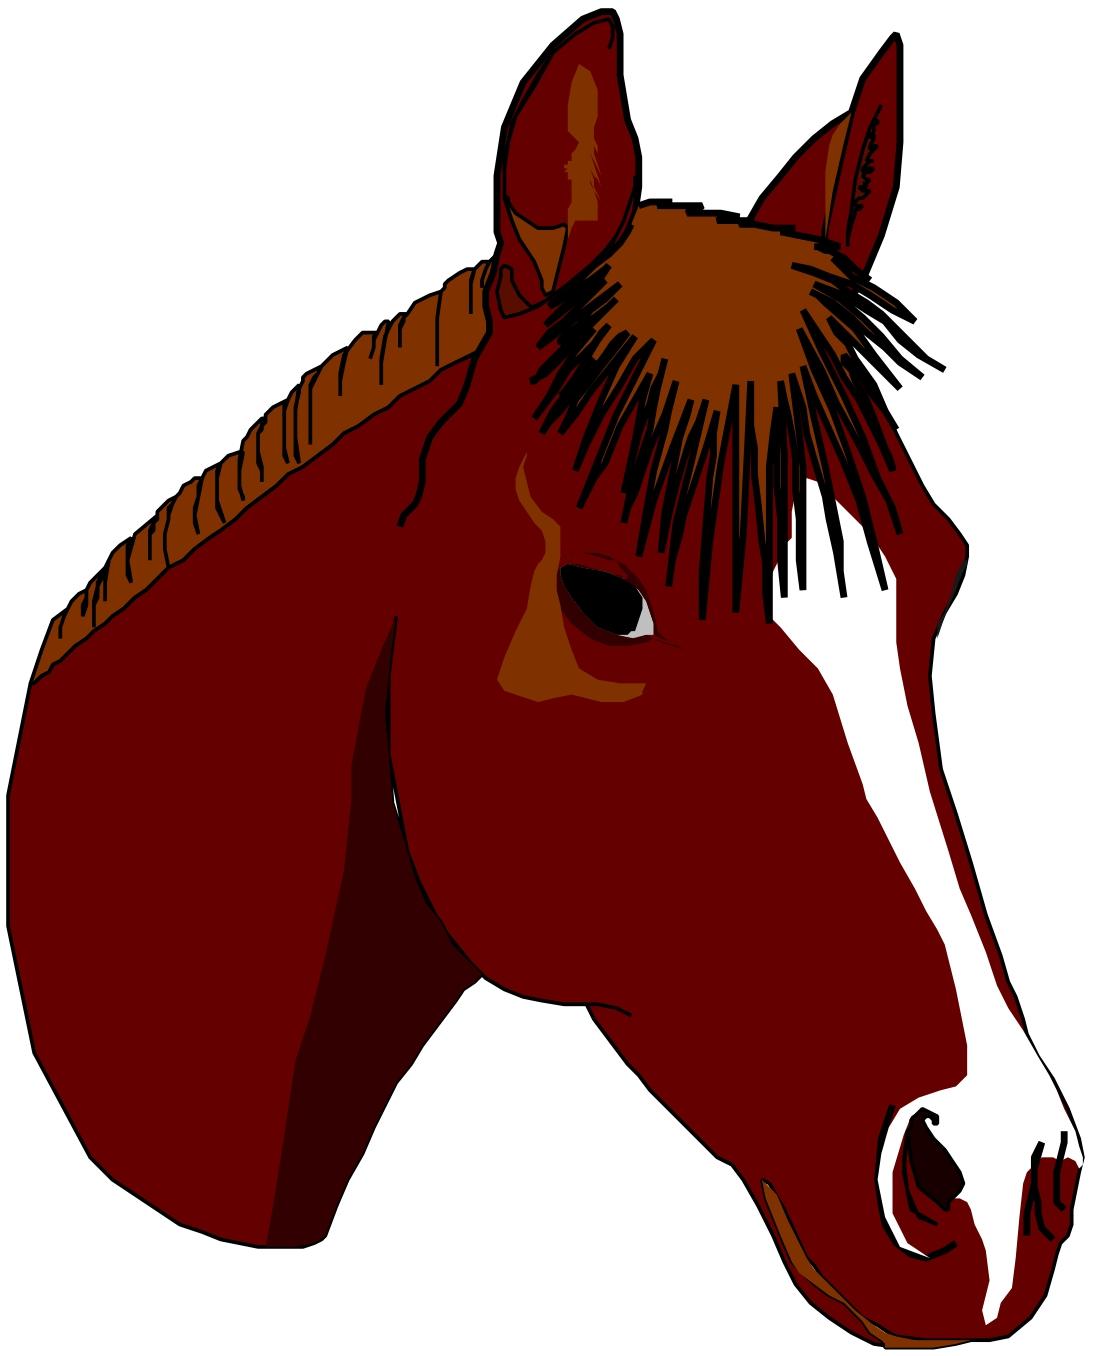 Horse Face Clipart - Clipart Kid